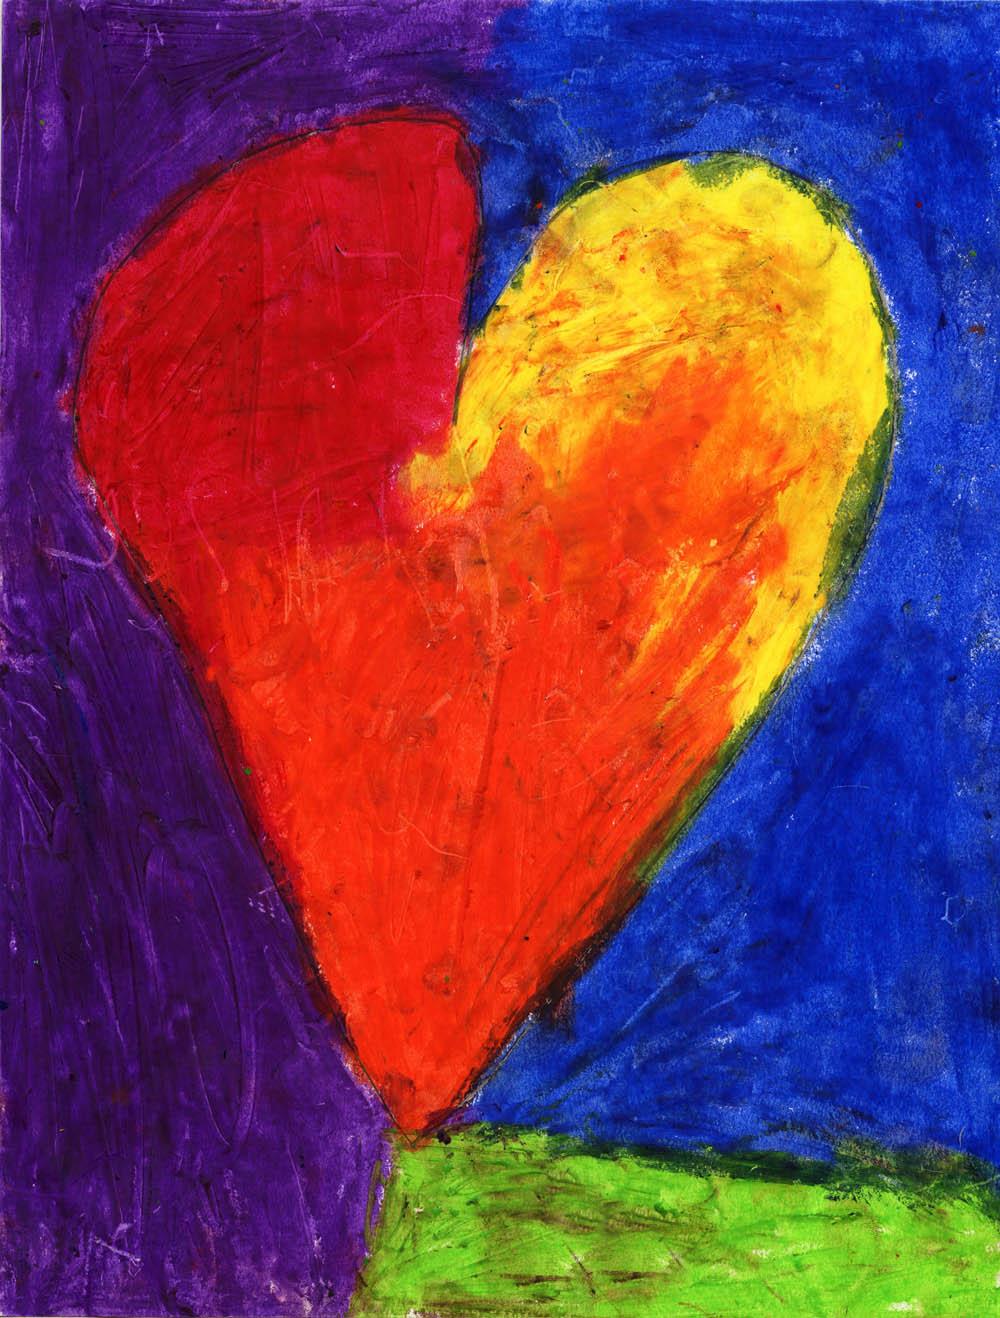 Oil Pastel Heart Art Projects For Kids